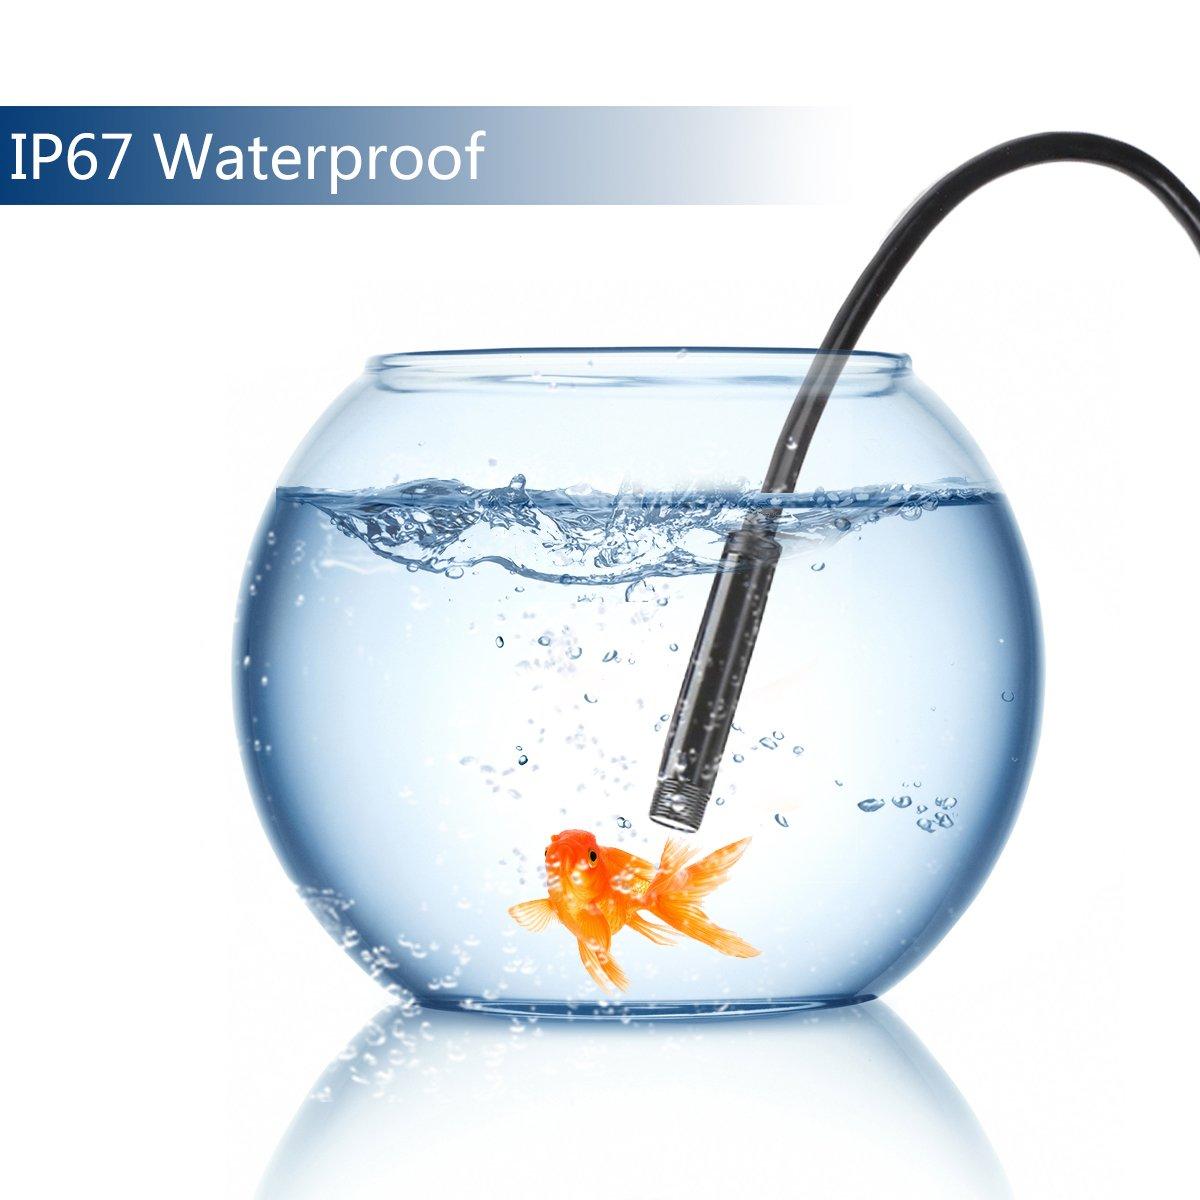 Windows PC und MacBook 5,5mm Android USB Endoskop SHEKAR 3,5M 3-in-1 USB//Micro USB//Type-C Boreskop Inspektionskamera Wasserdicht f/ür Android Phone//Tablet